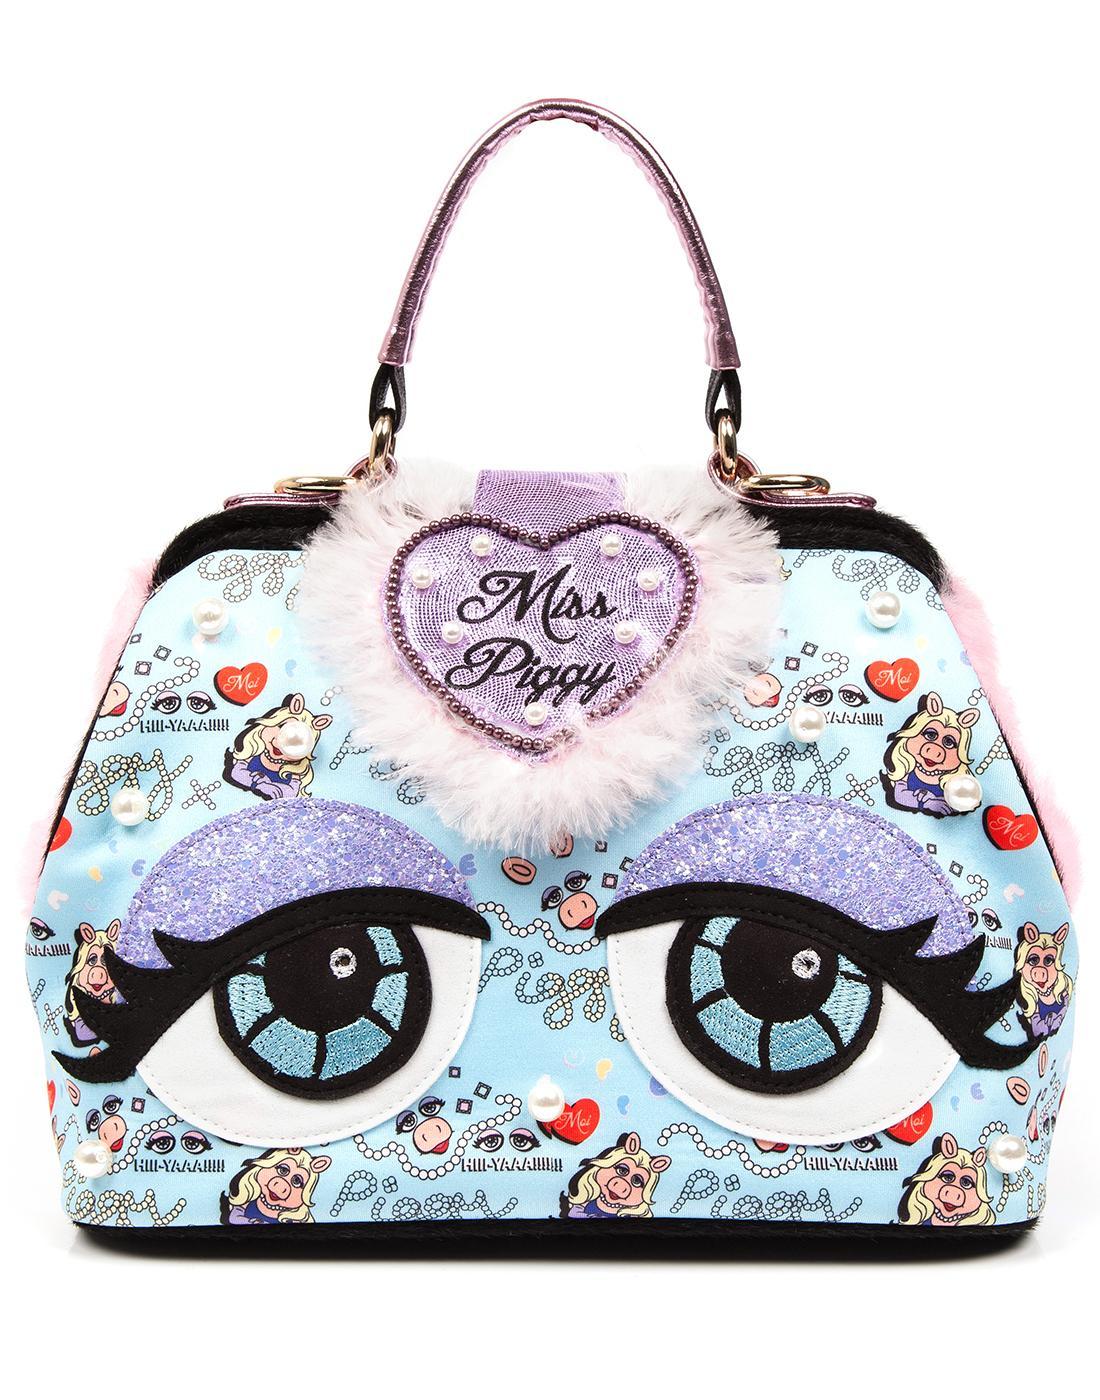 Who? Moi? IRREGULAR CHOICE x THE MUPPETS Handbag